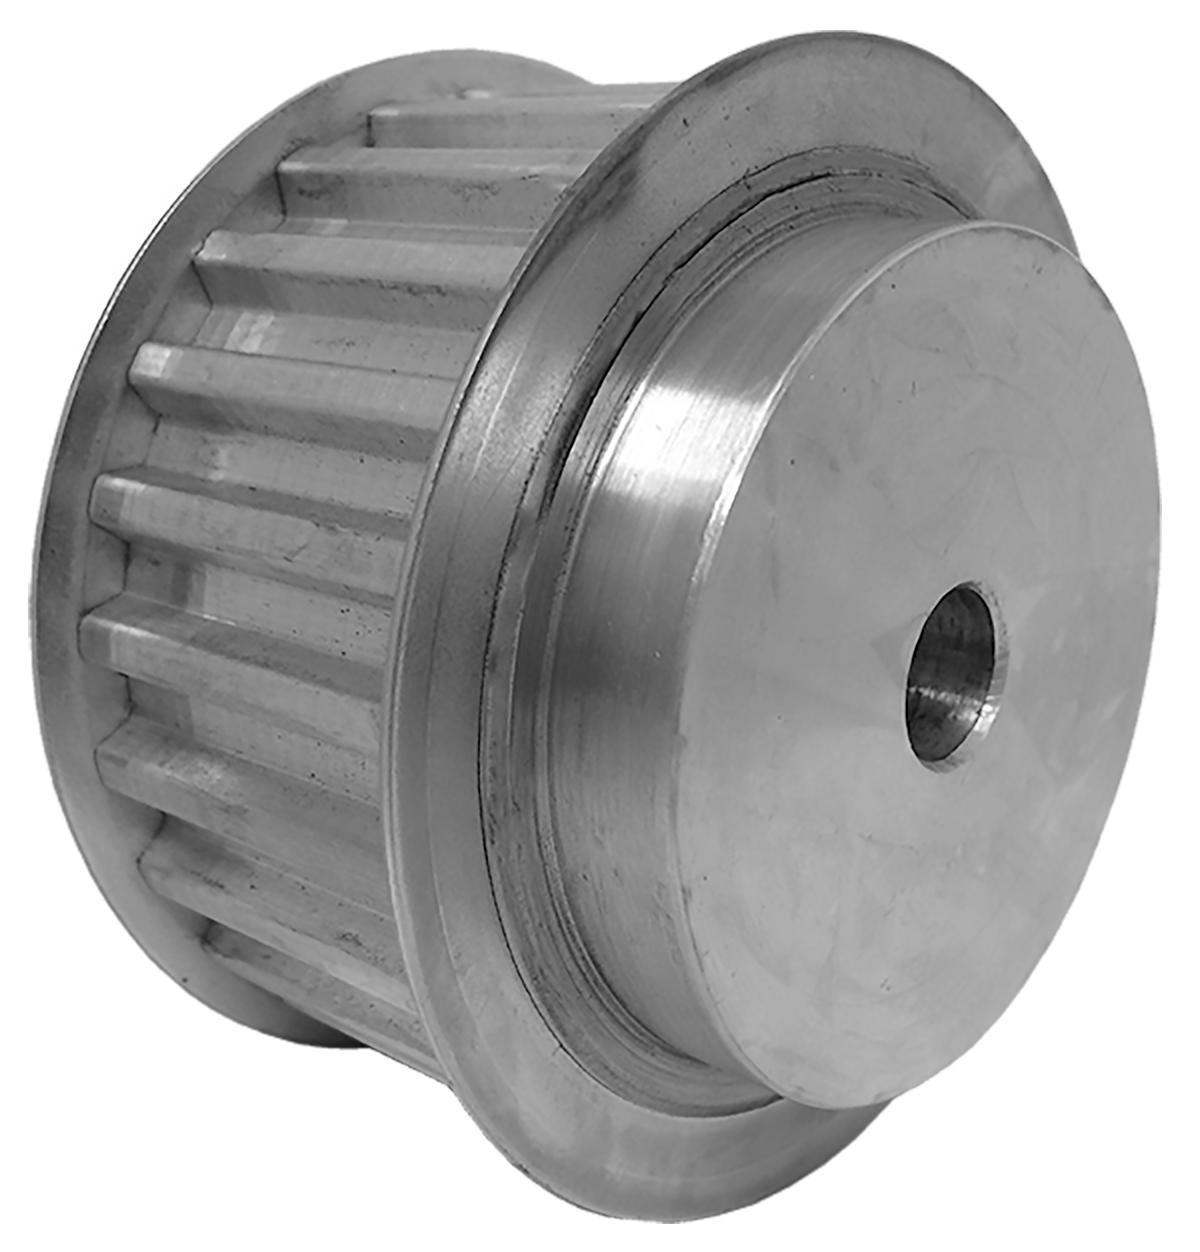 47T10/25-2 - Aluminum Metric Pulleys